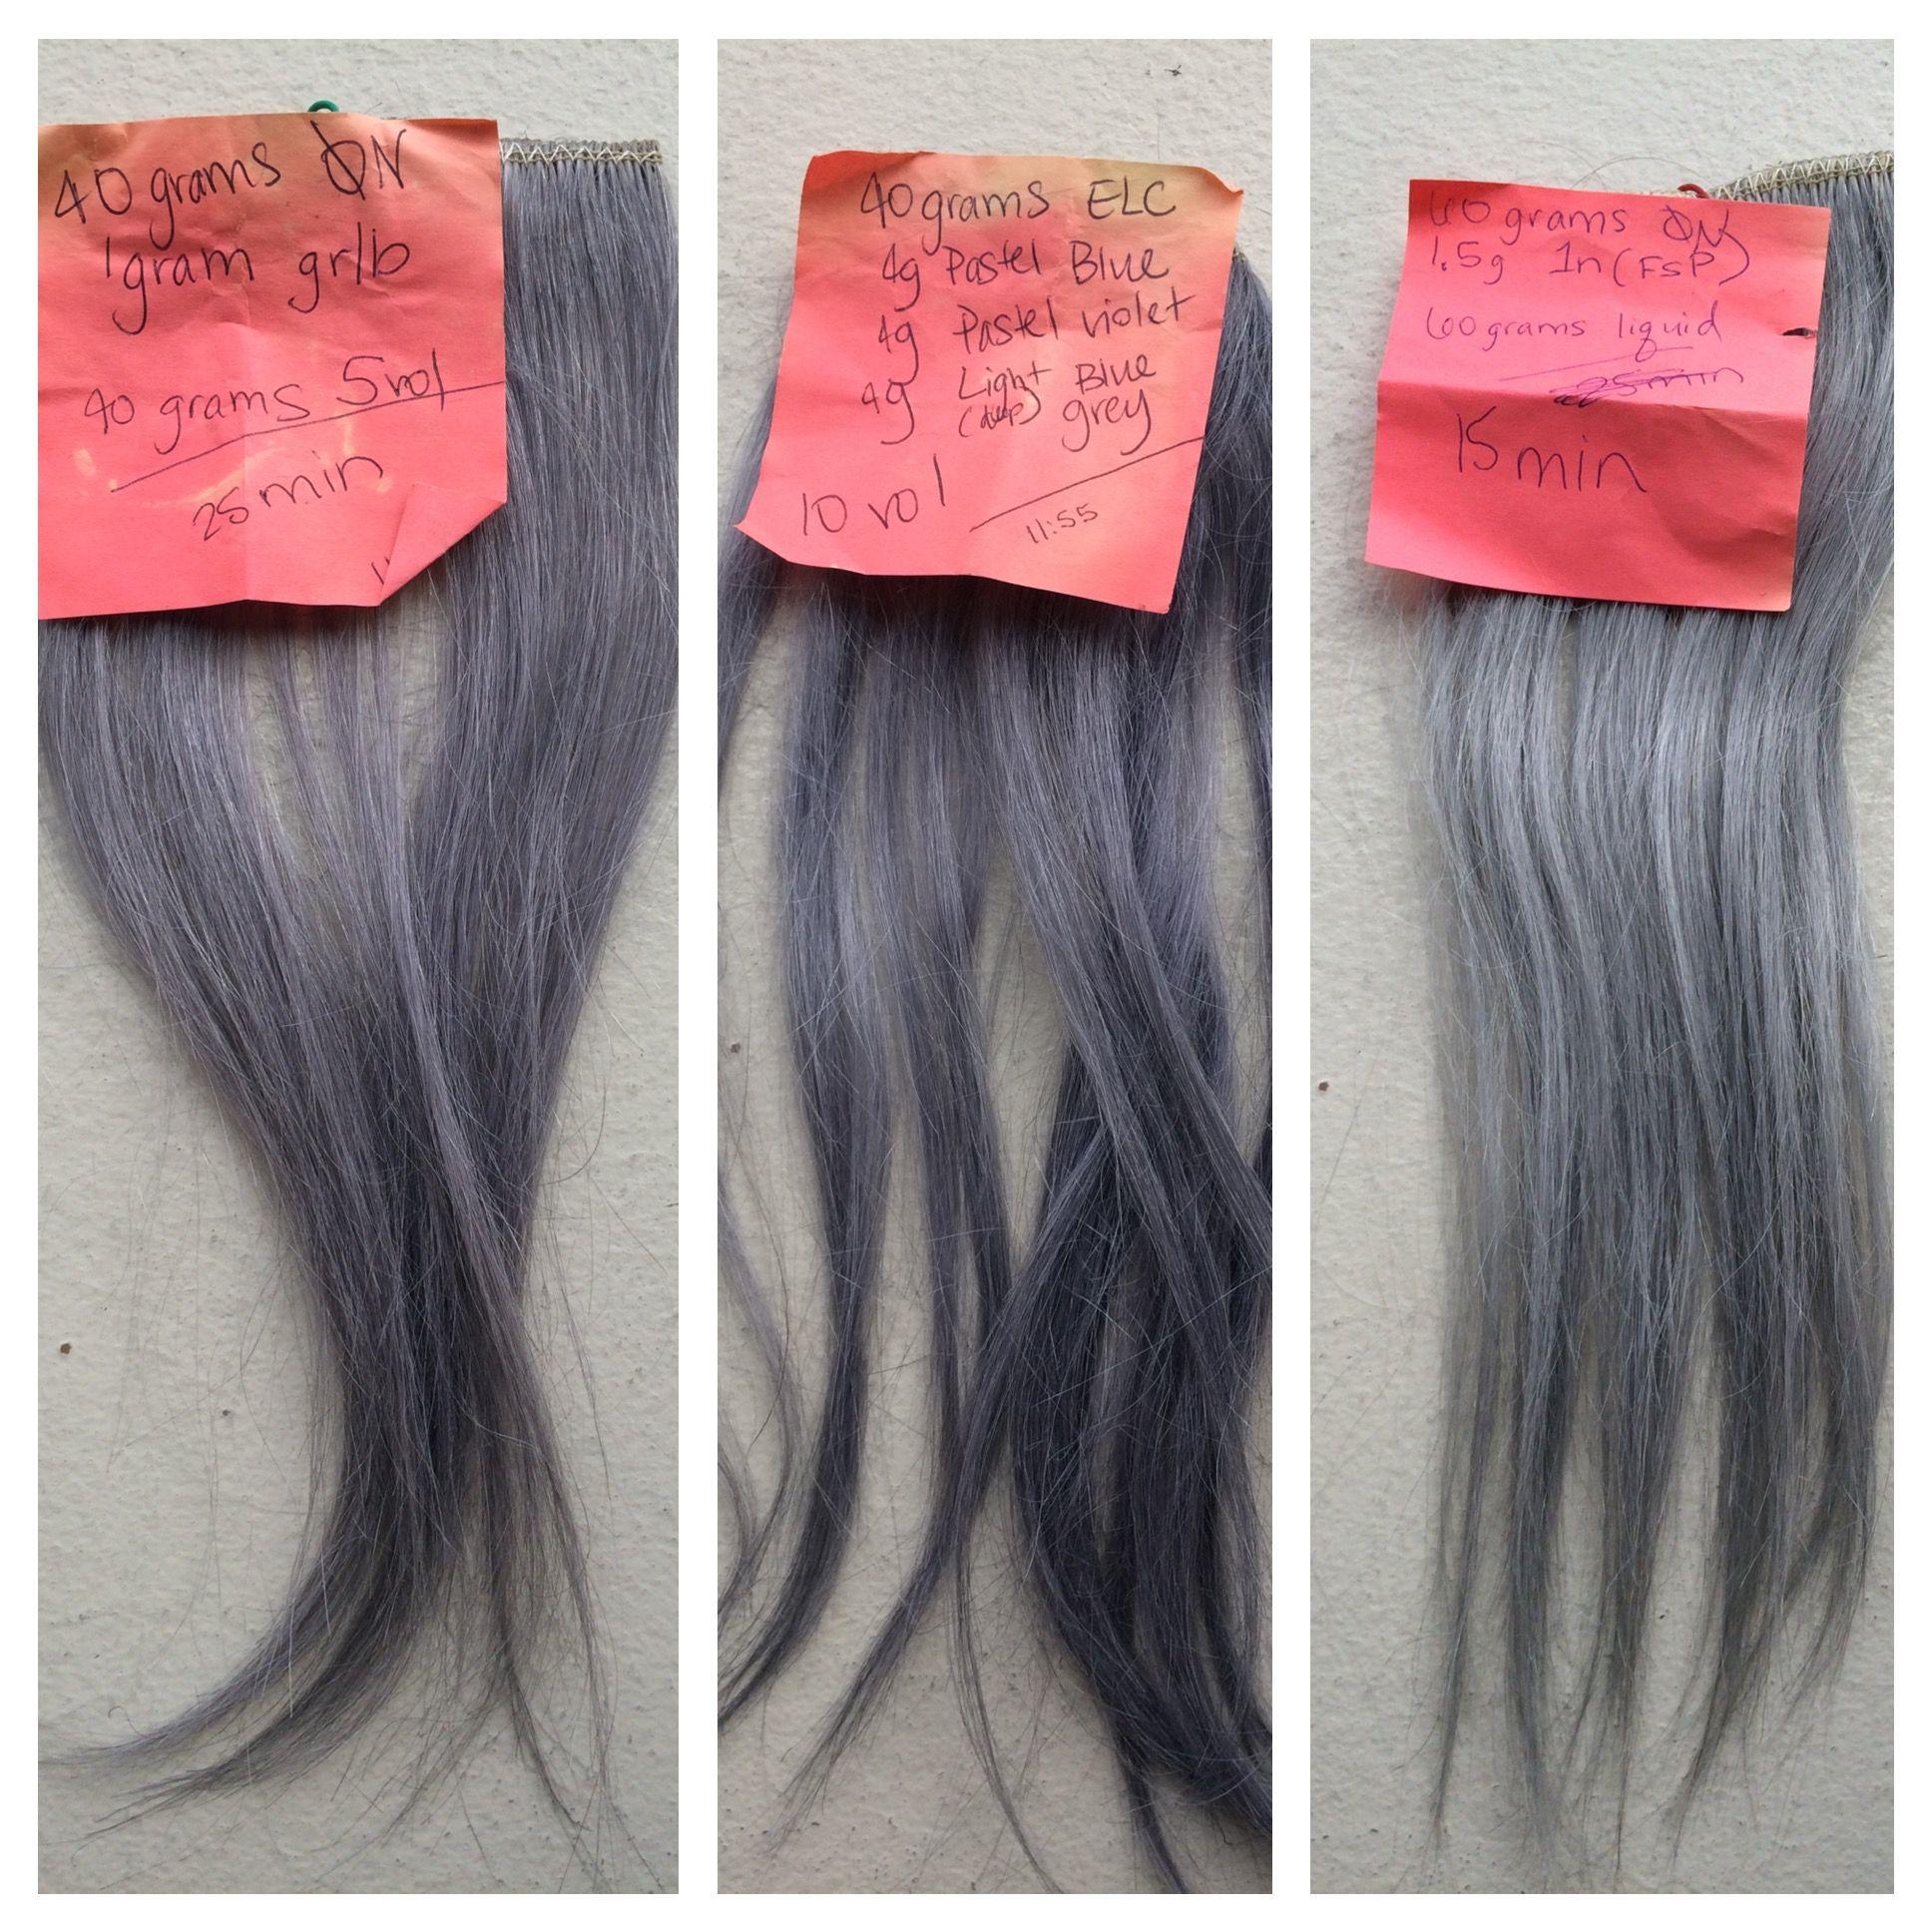 Aveda Gray Hair Color Formulas Done On Blonde Hair Wefts Follow Christybruski On Instagram Elite Hai Aveda Hair Color Grey Hair Color Hair Color Formulas